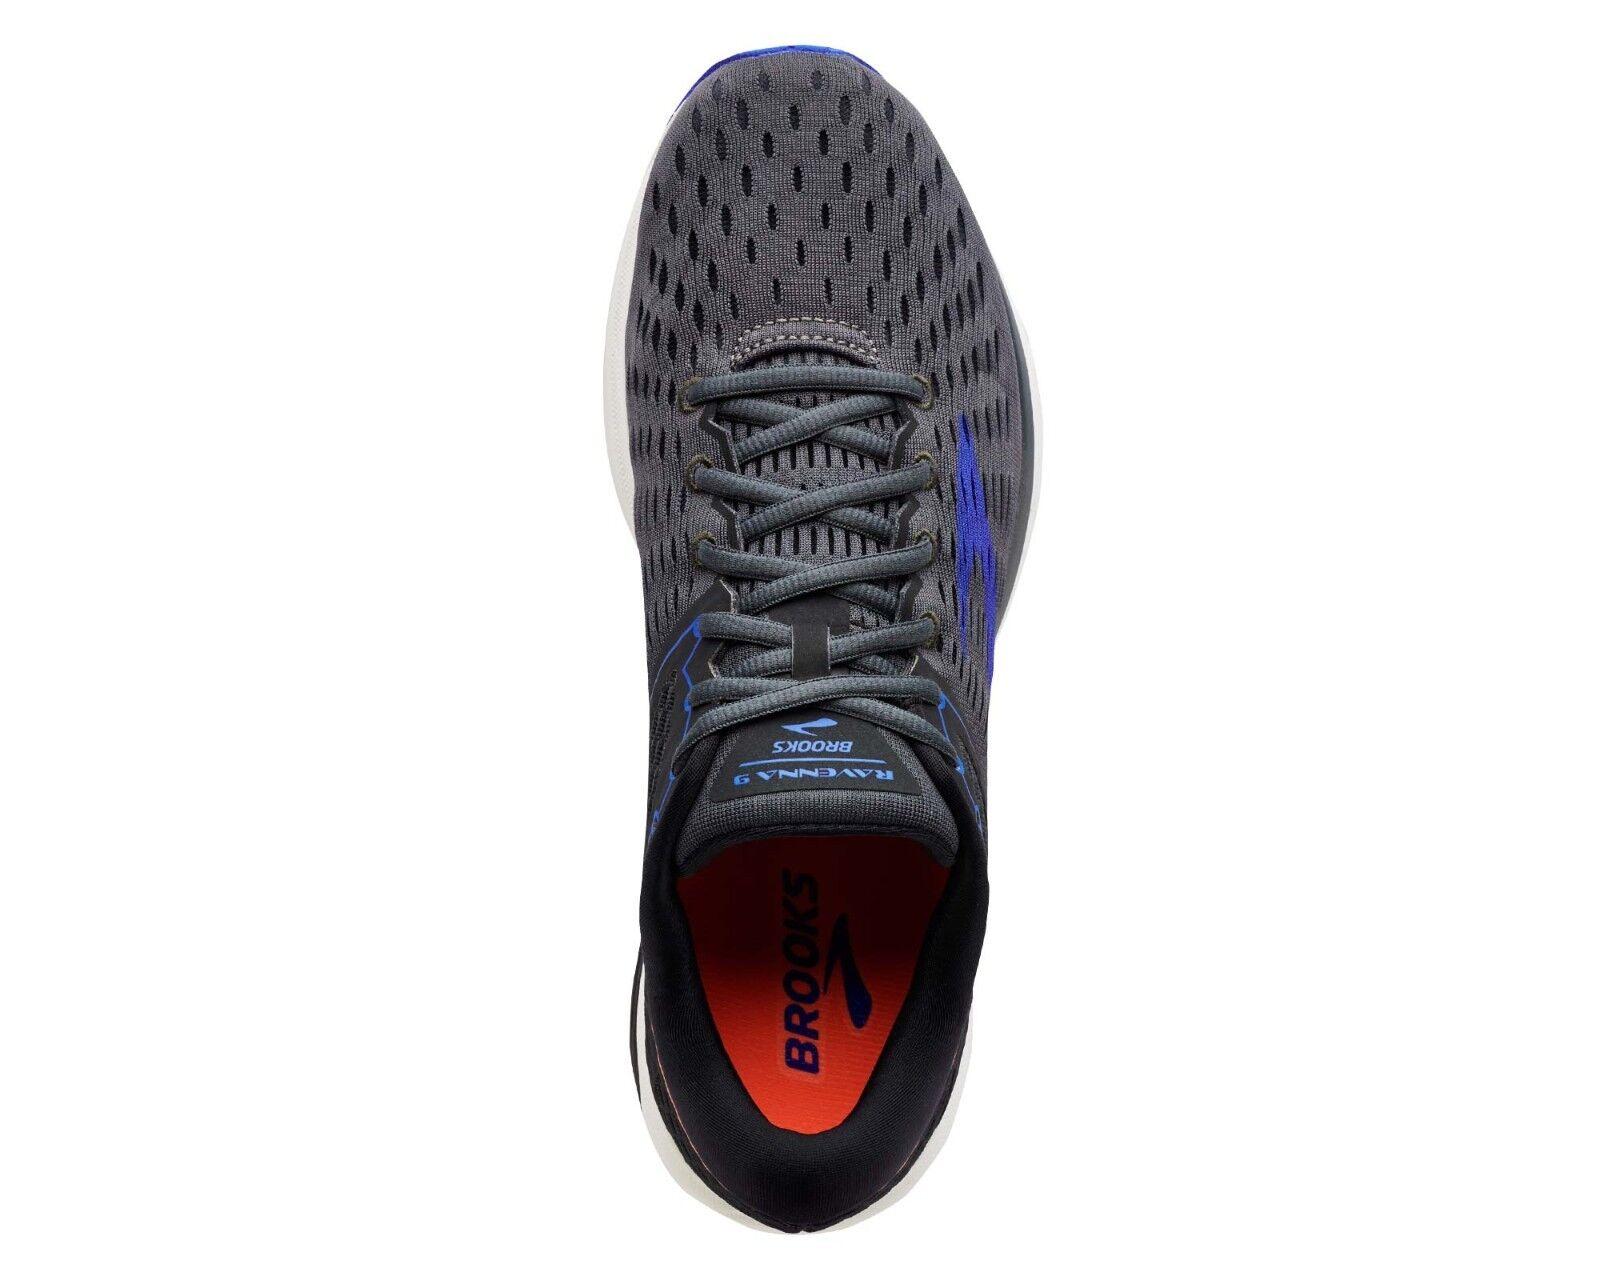 pretty nice 93c03 ff364 ... SAVE     Brooks Ravenna 9 9 9 Mens Running Shoes (D) ...